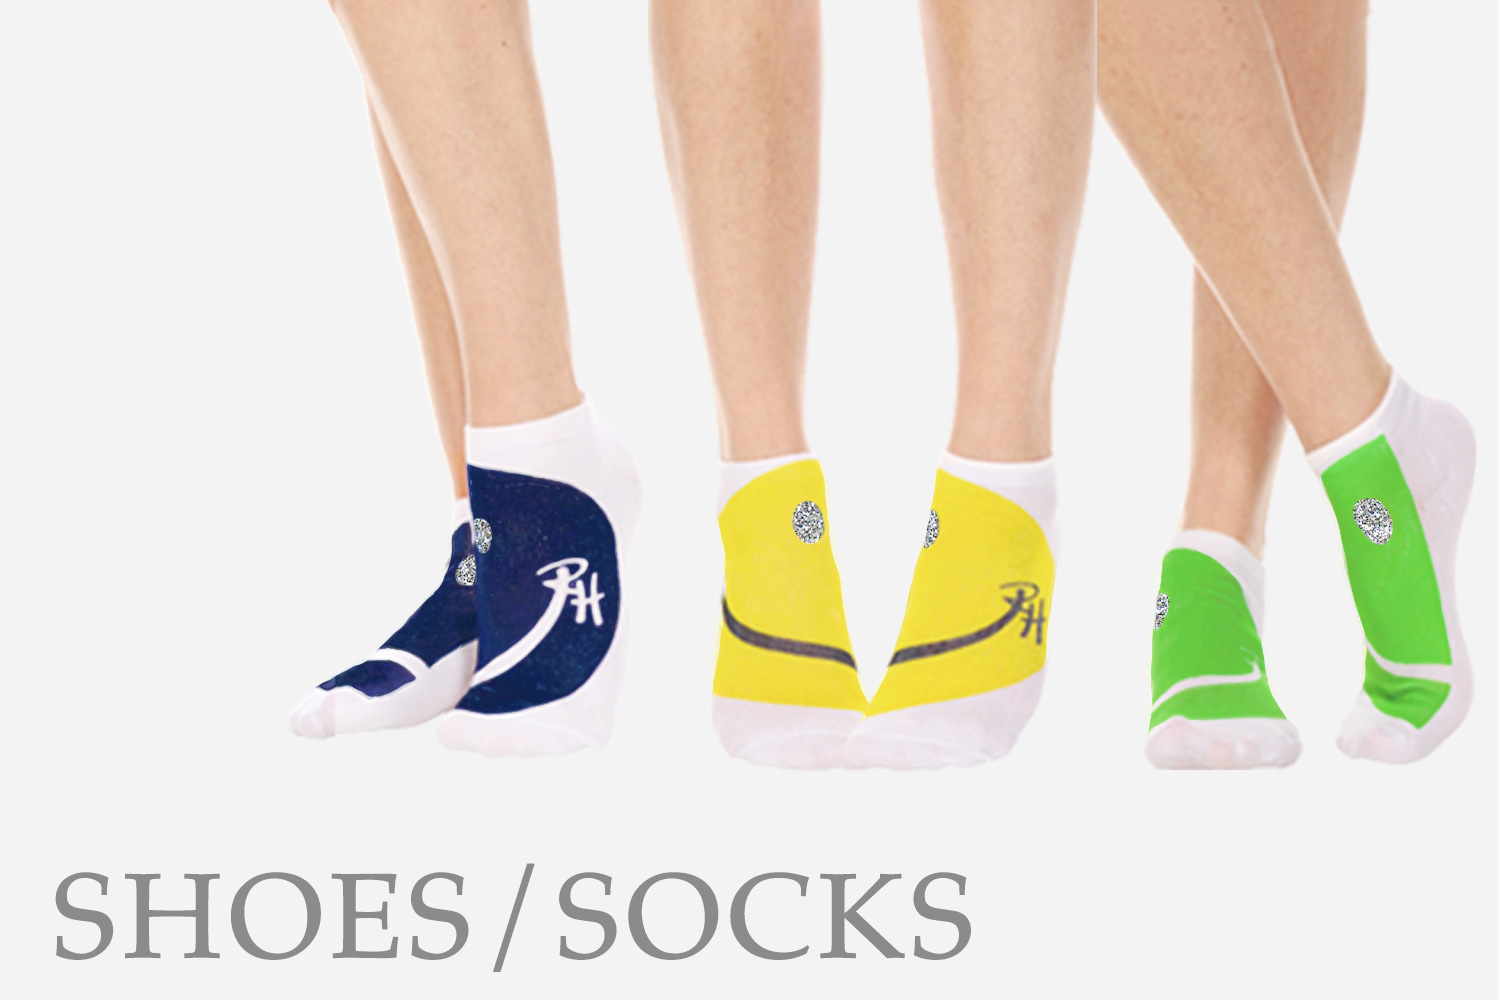 Shop Womens Shoes / Socks